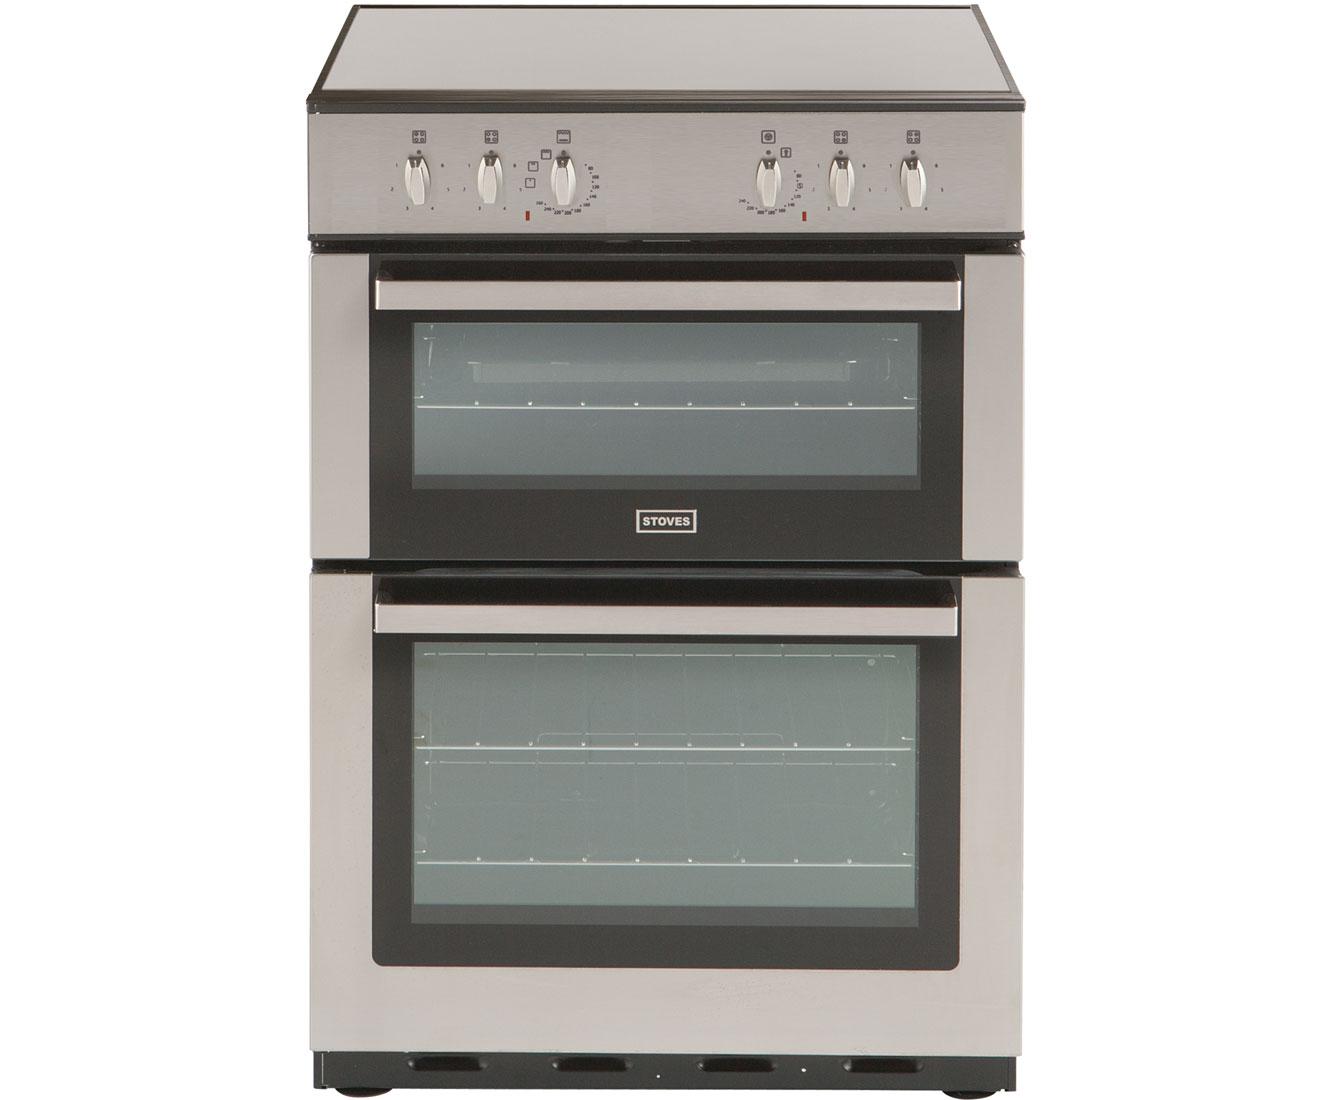 stoves sec60do electric cooker with ceramic hob. Black Bedroom Furniture Sets. Home Design Ideas